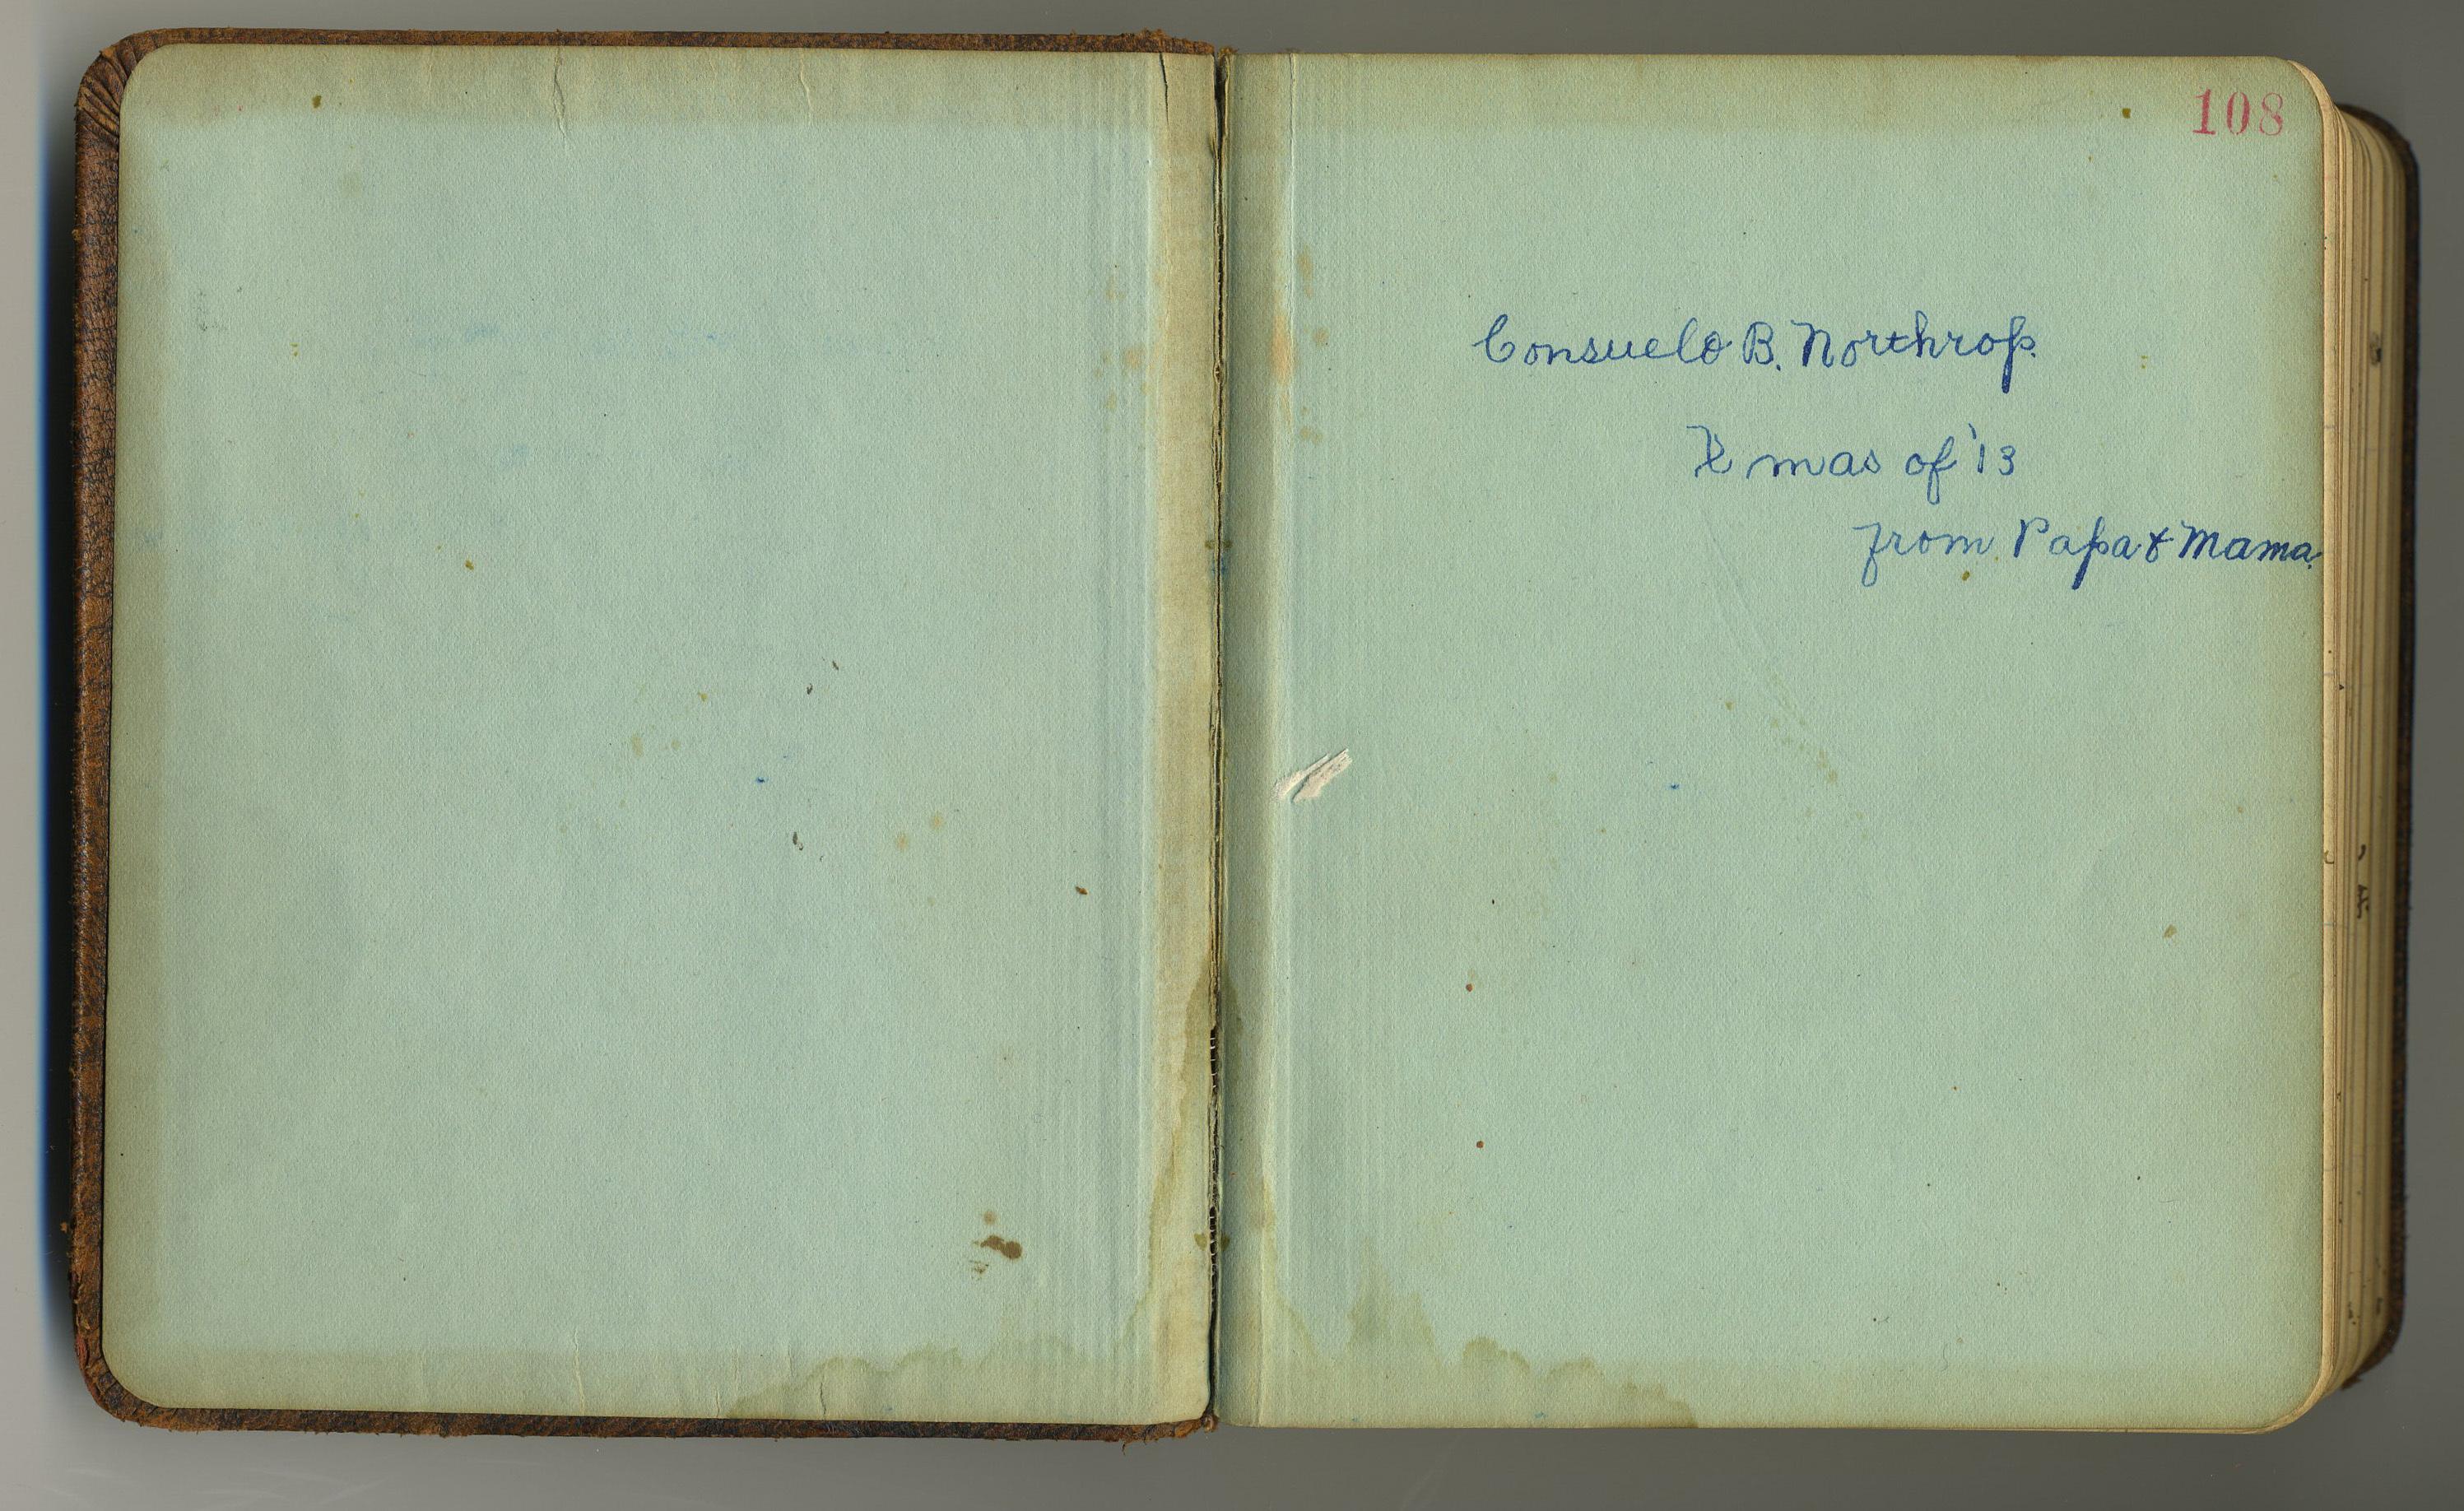 UVM Student Diary, Consuelo Northrop Bailey, 1914-1918